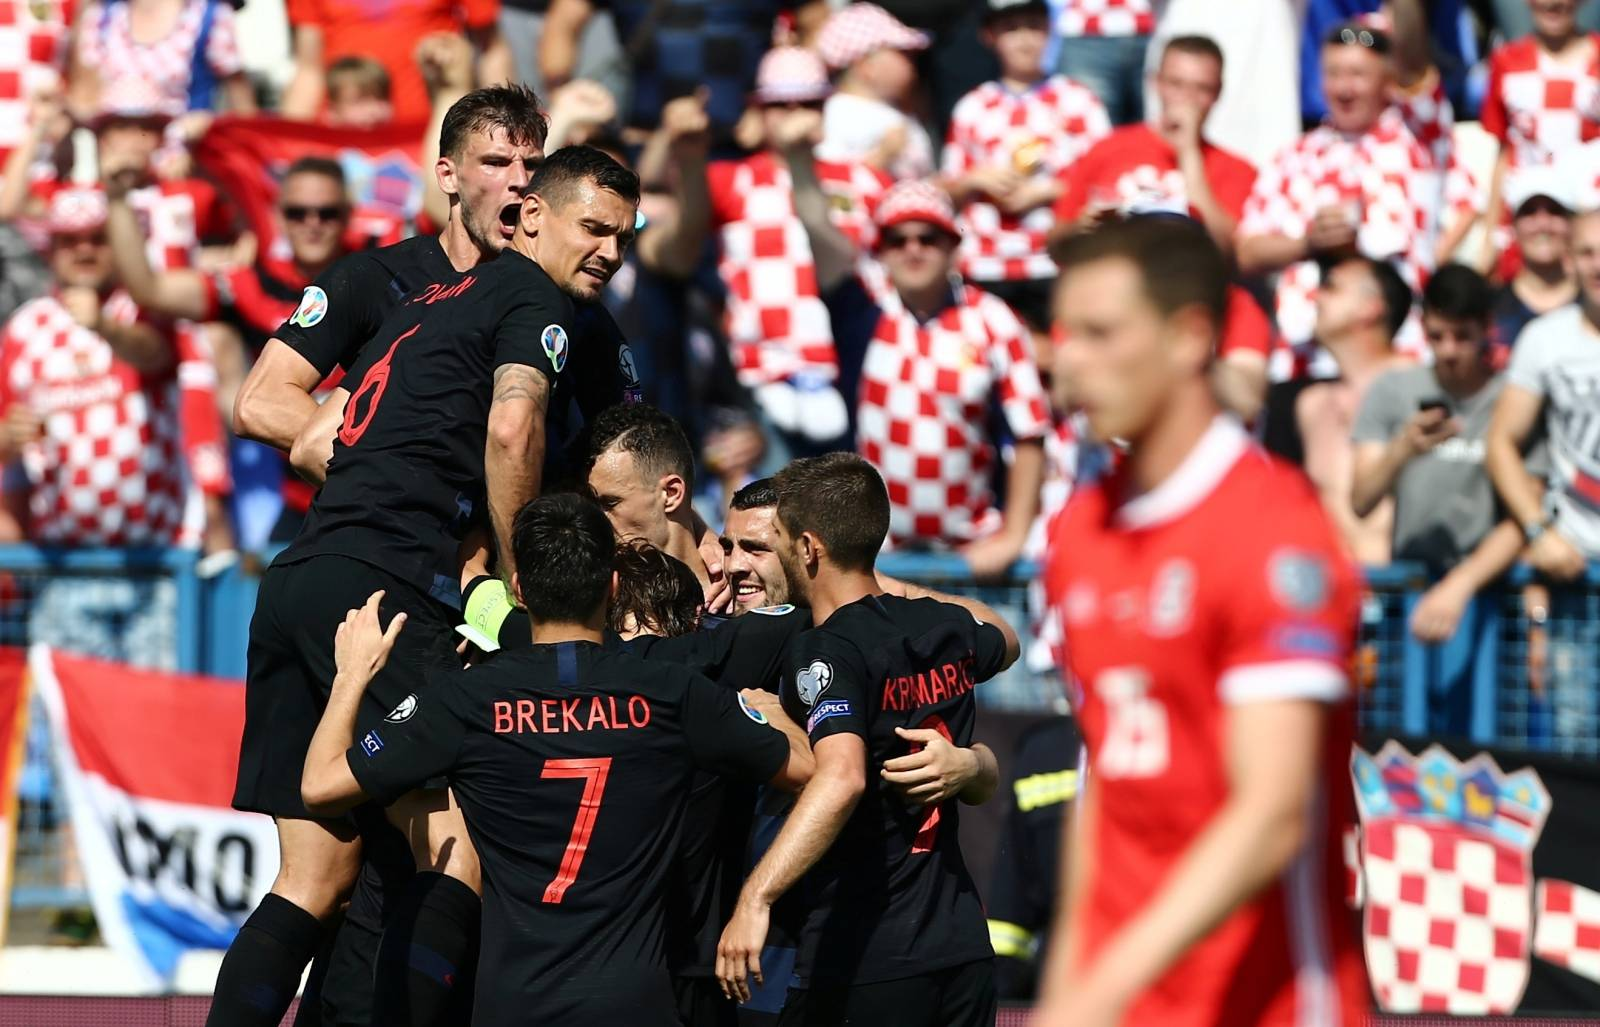 Euro 2020 Qualifier - Group E - Croatia v Wales